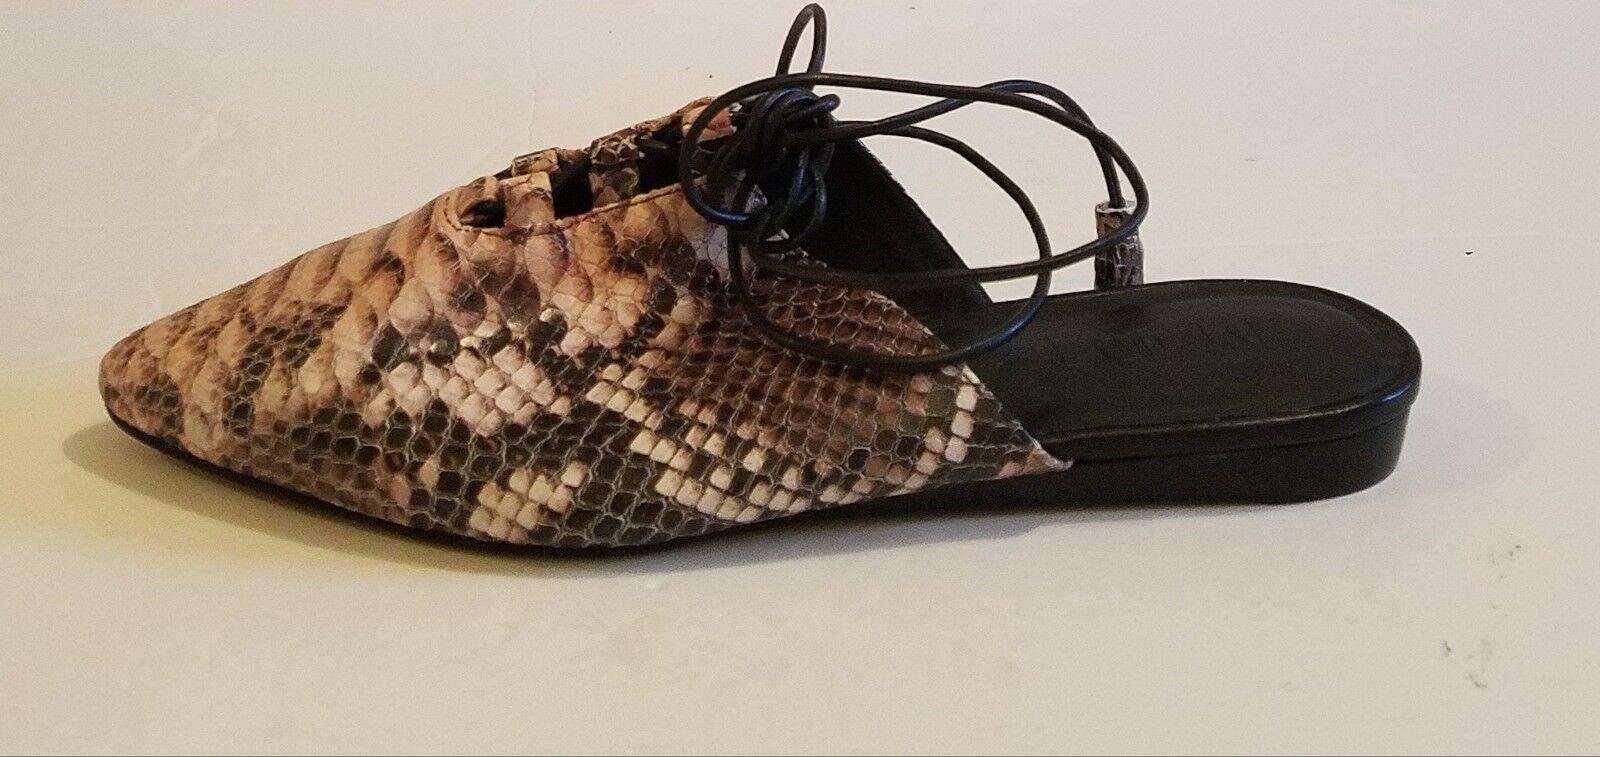 i nuovi marchi outlet online M4D3 Della Dusty rosa rosa rosa Snakeskin Embossed leather Ankle Wrap Flat Mule sz 6  autorizzazione ufficiale